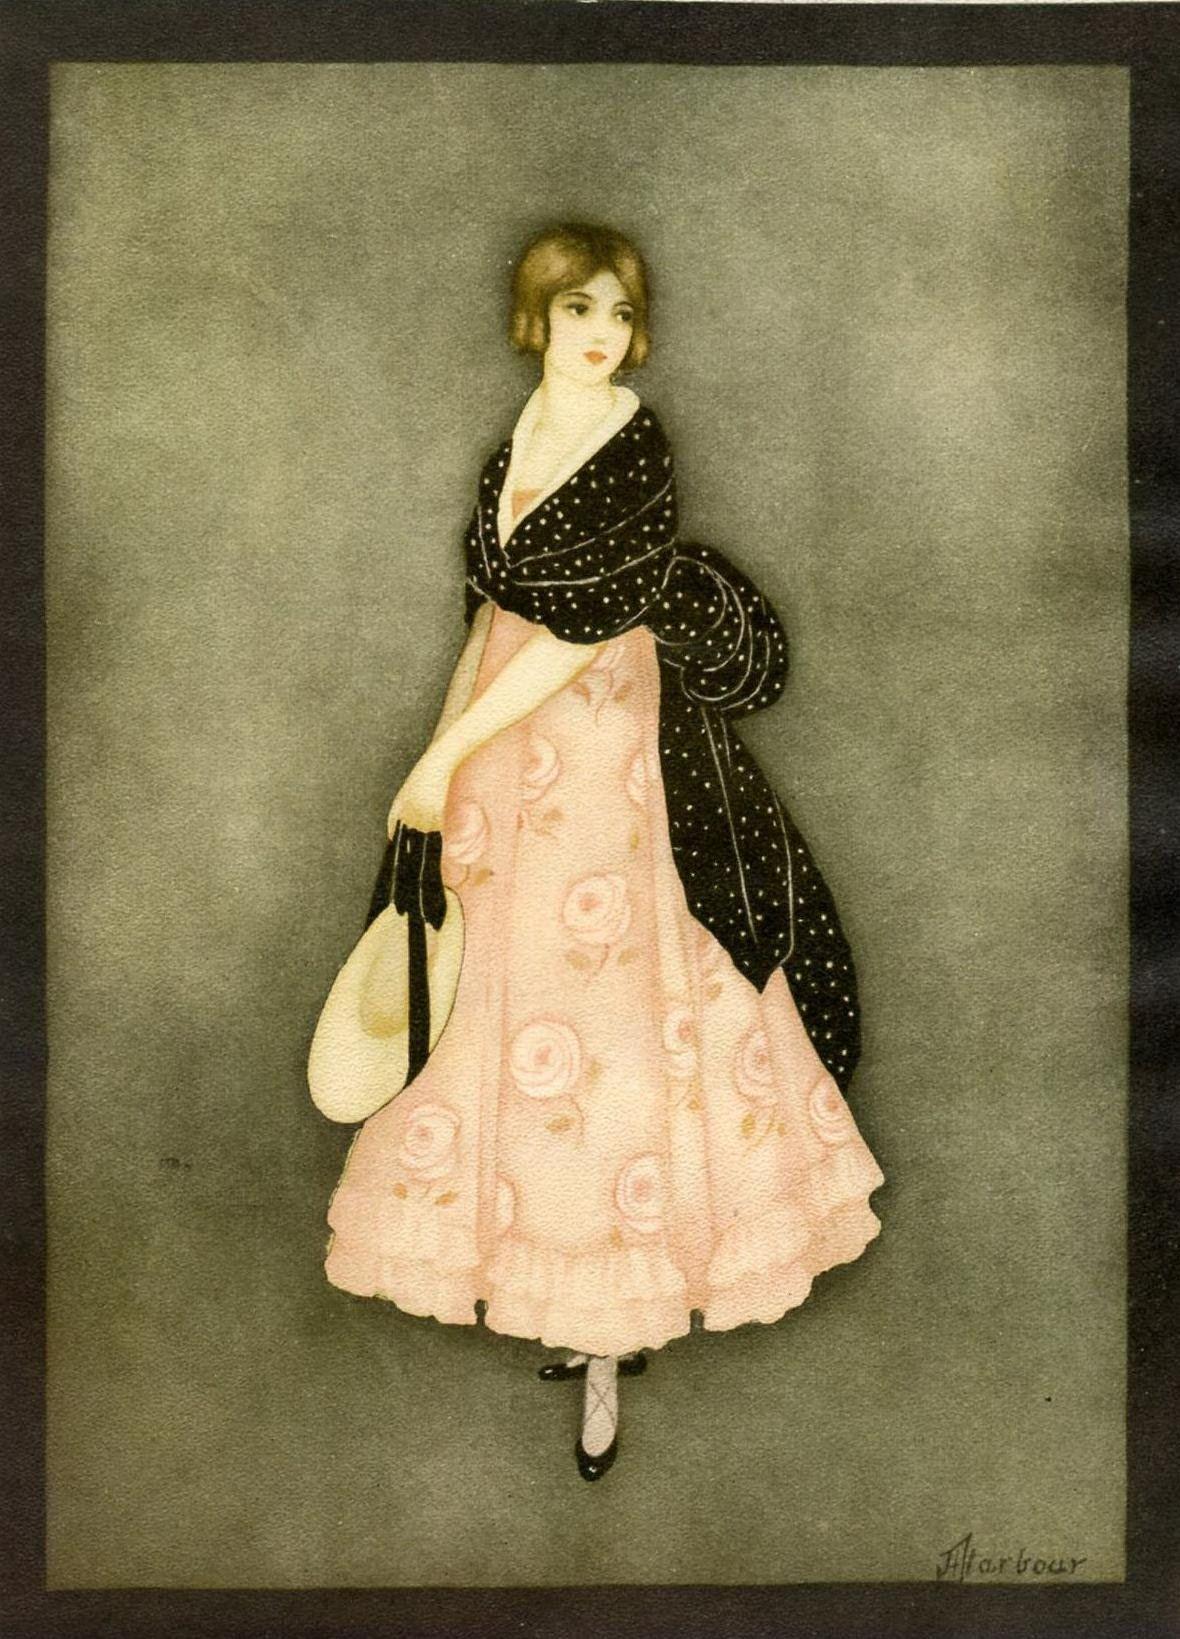 Jennie Harbour Prints For Sale Jennie Harbour Website Fashion Illustration Prints For Sale Vintage Illustration